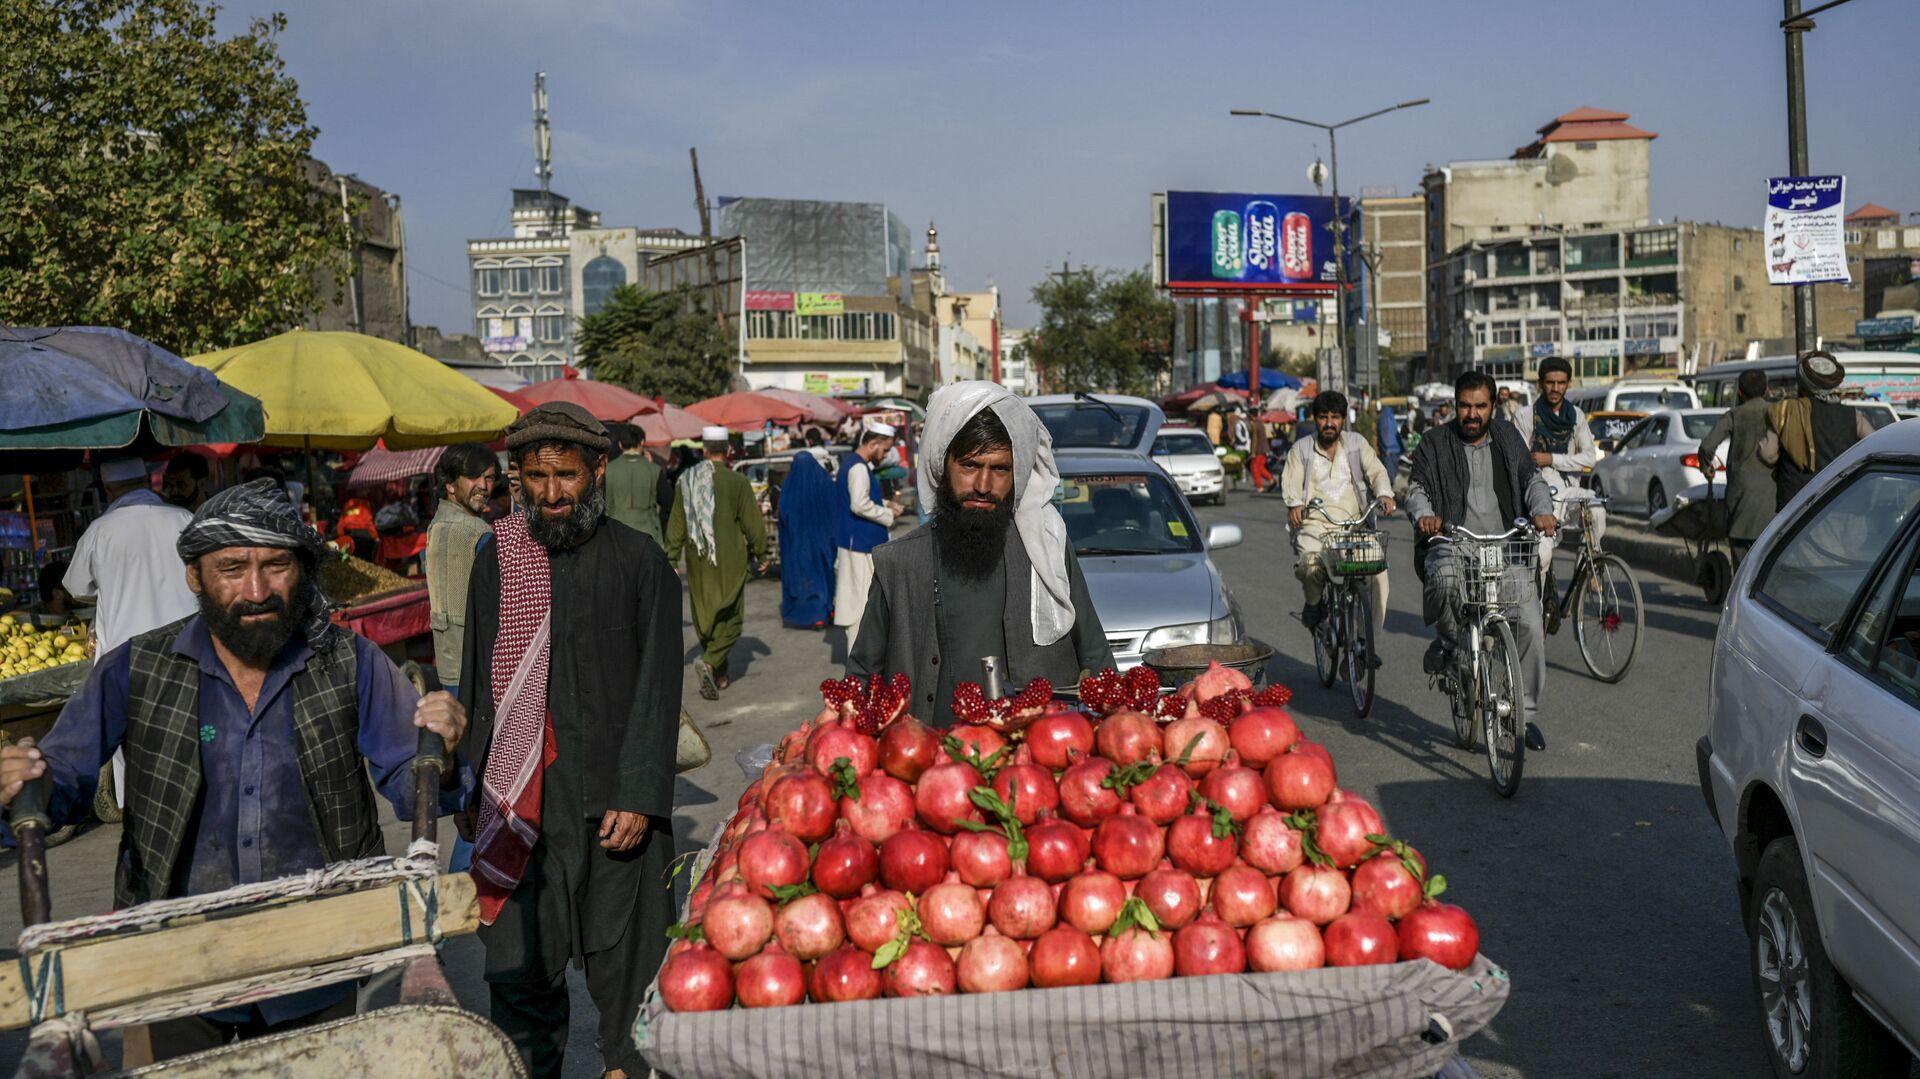 Продавец гранатов на рынке в Кабуле - Sputnik Таджикистан, 1920, 26.09.2021